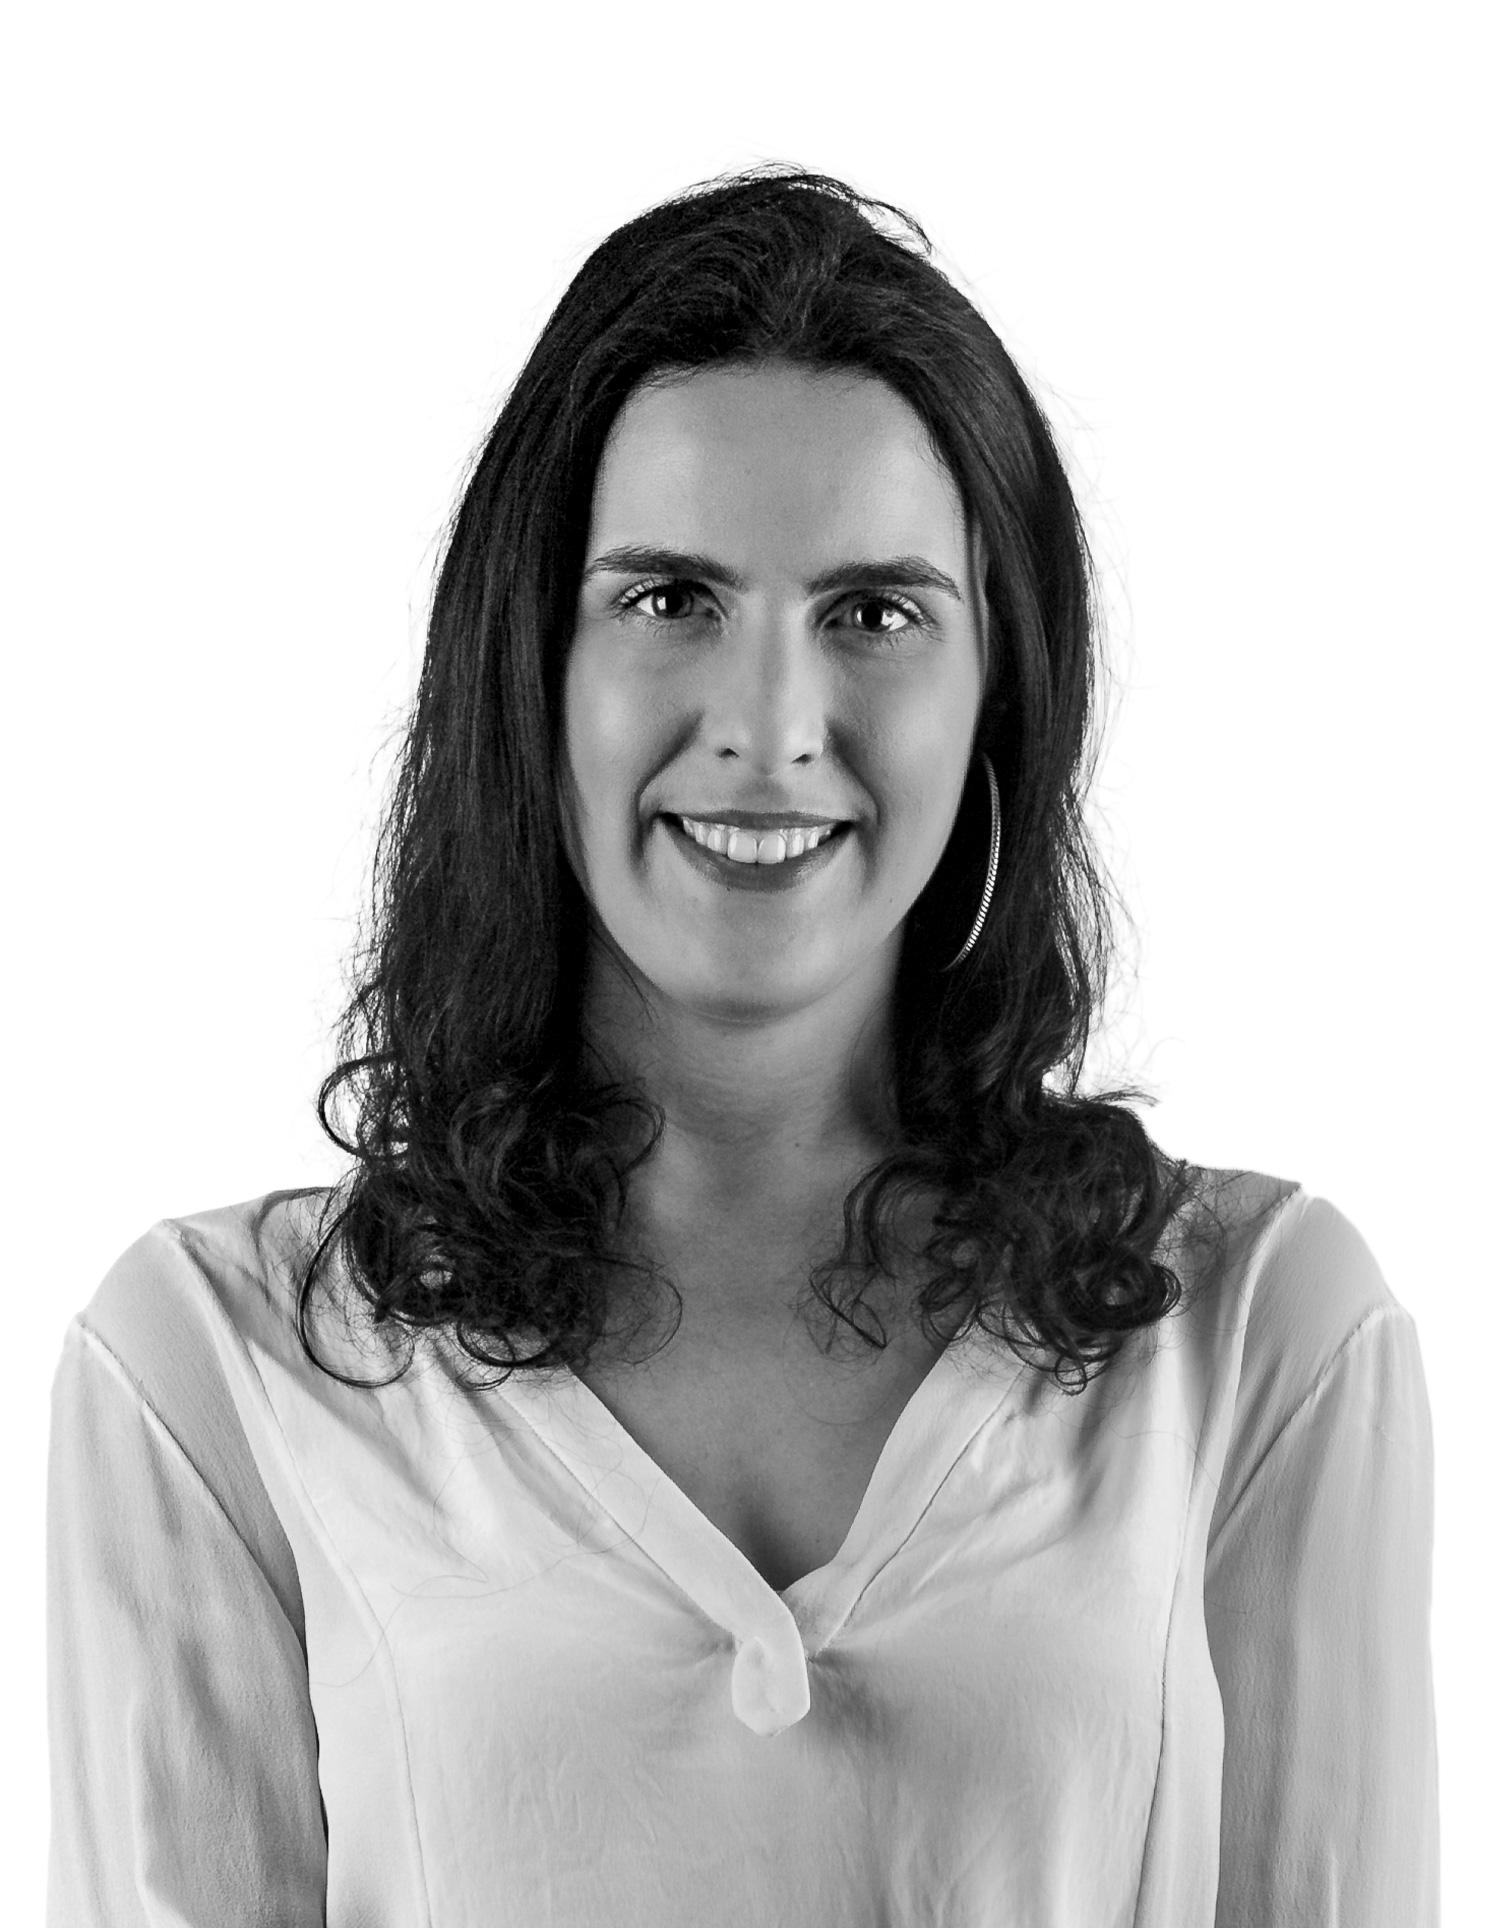 Paola Fiamoncini